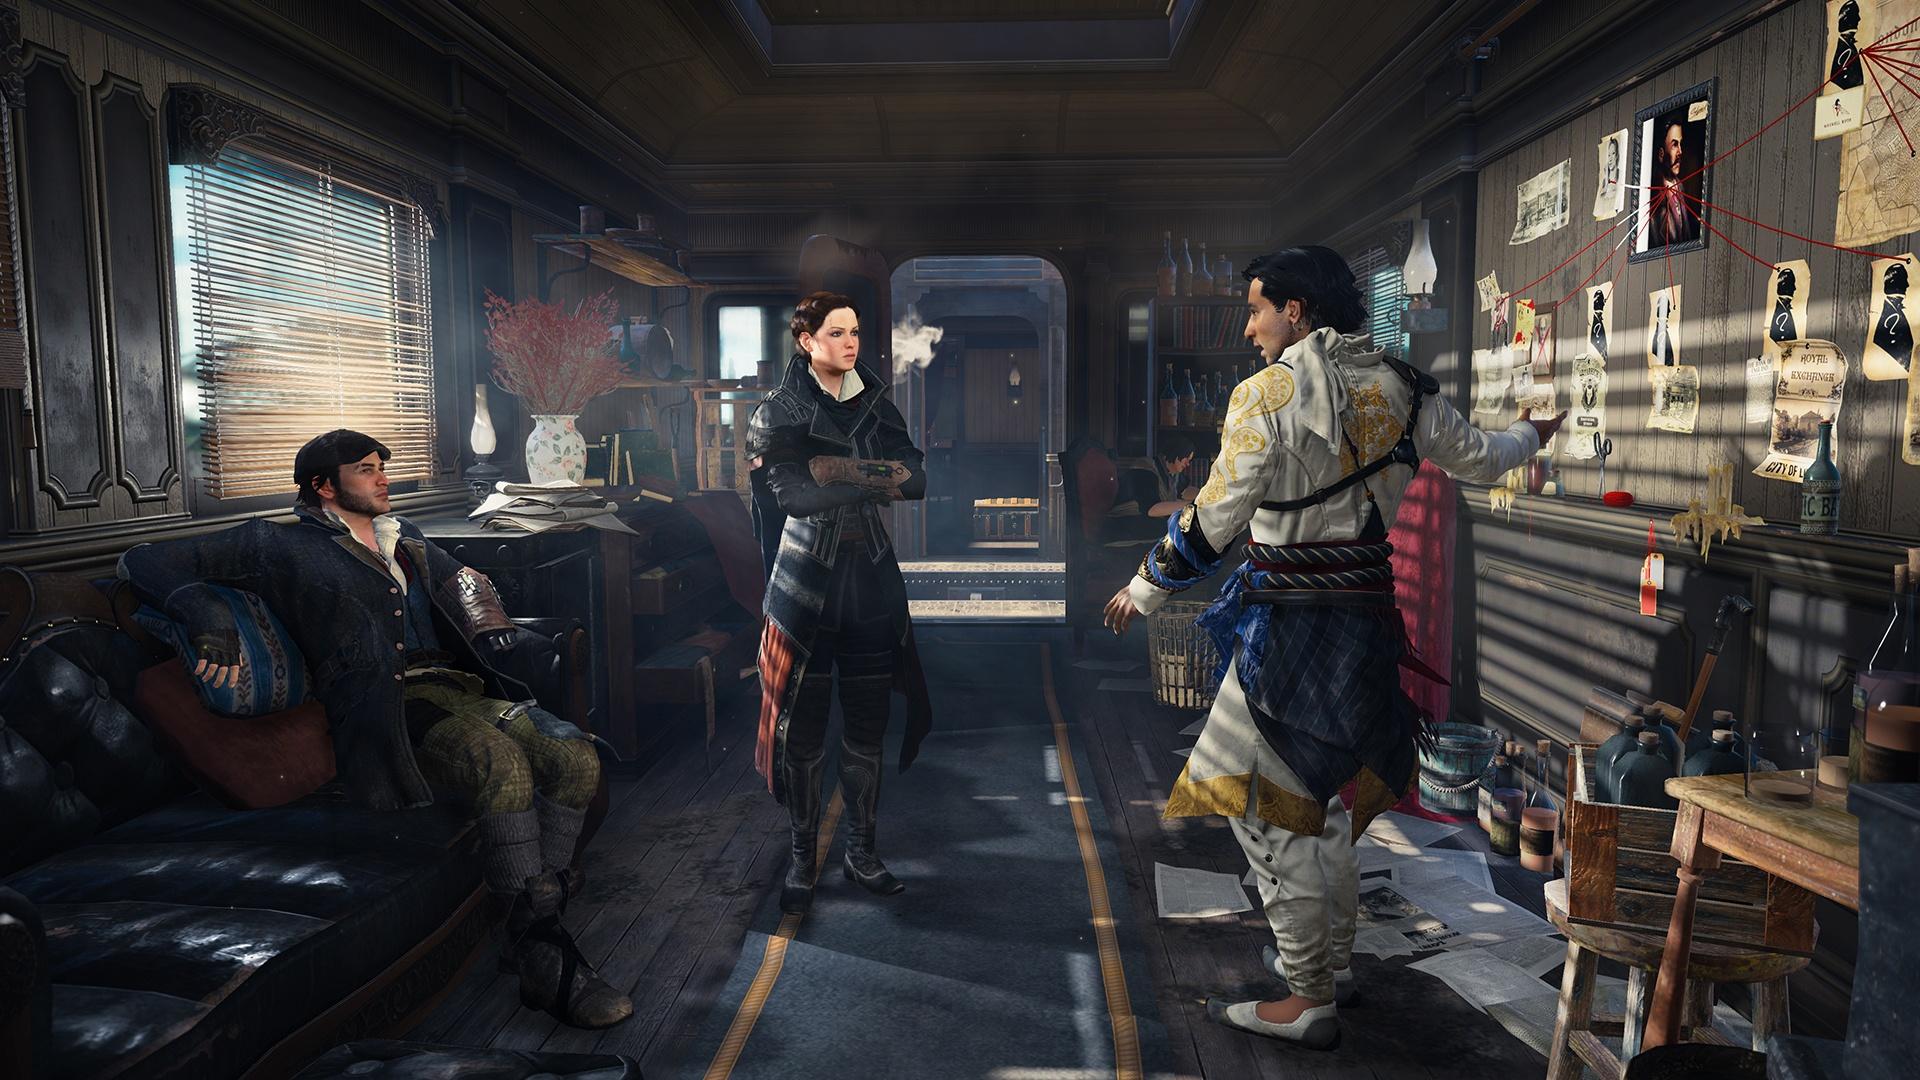 Photo of 40 غيغابايت هو حجم Assassin's Creed: Syndicate على اكسبوكس ون